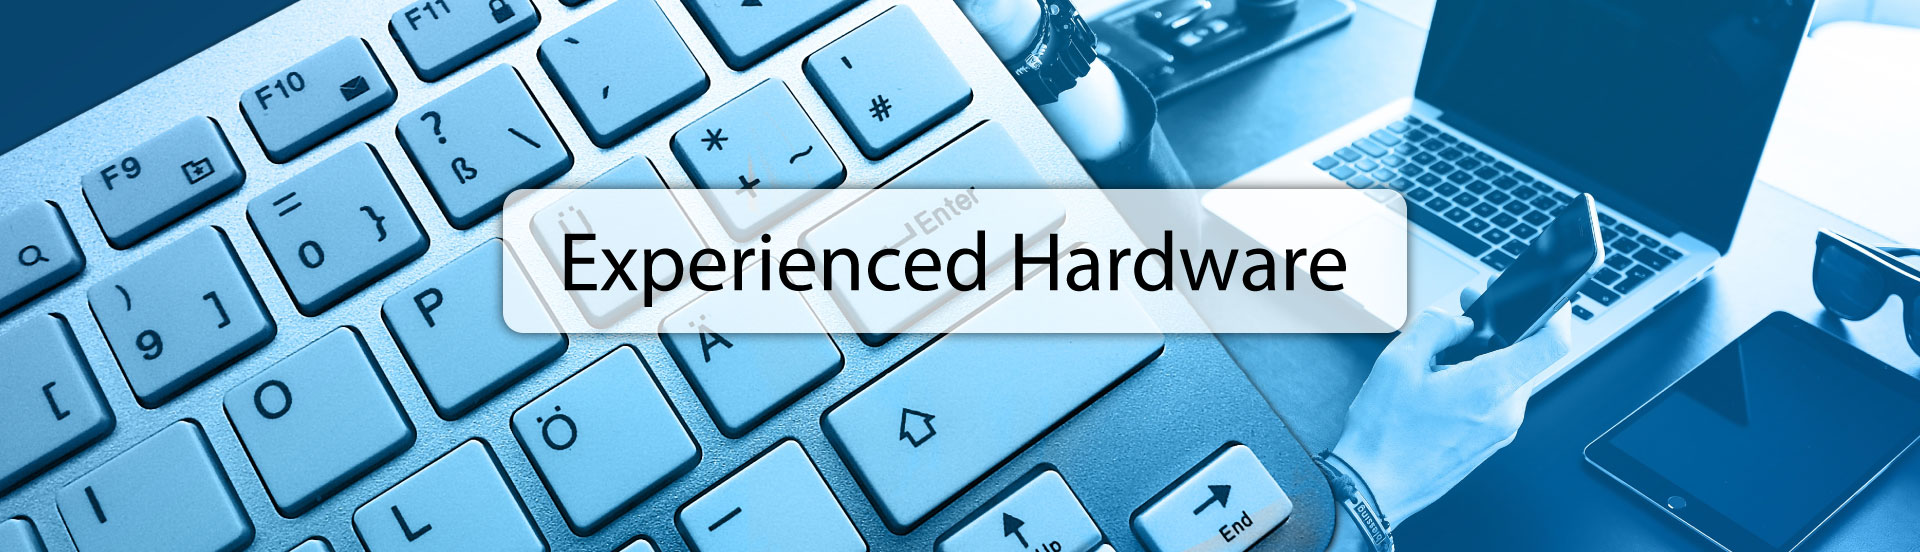 experienced hardware